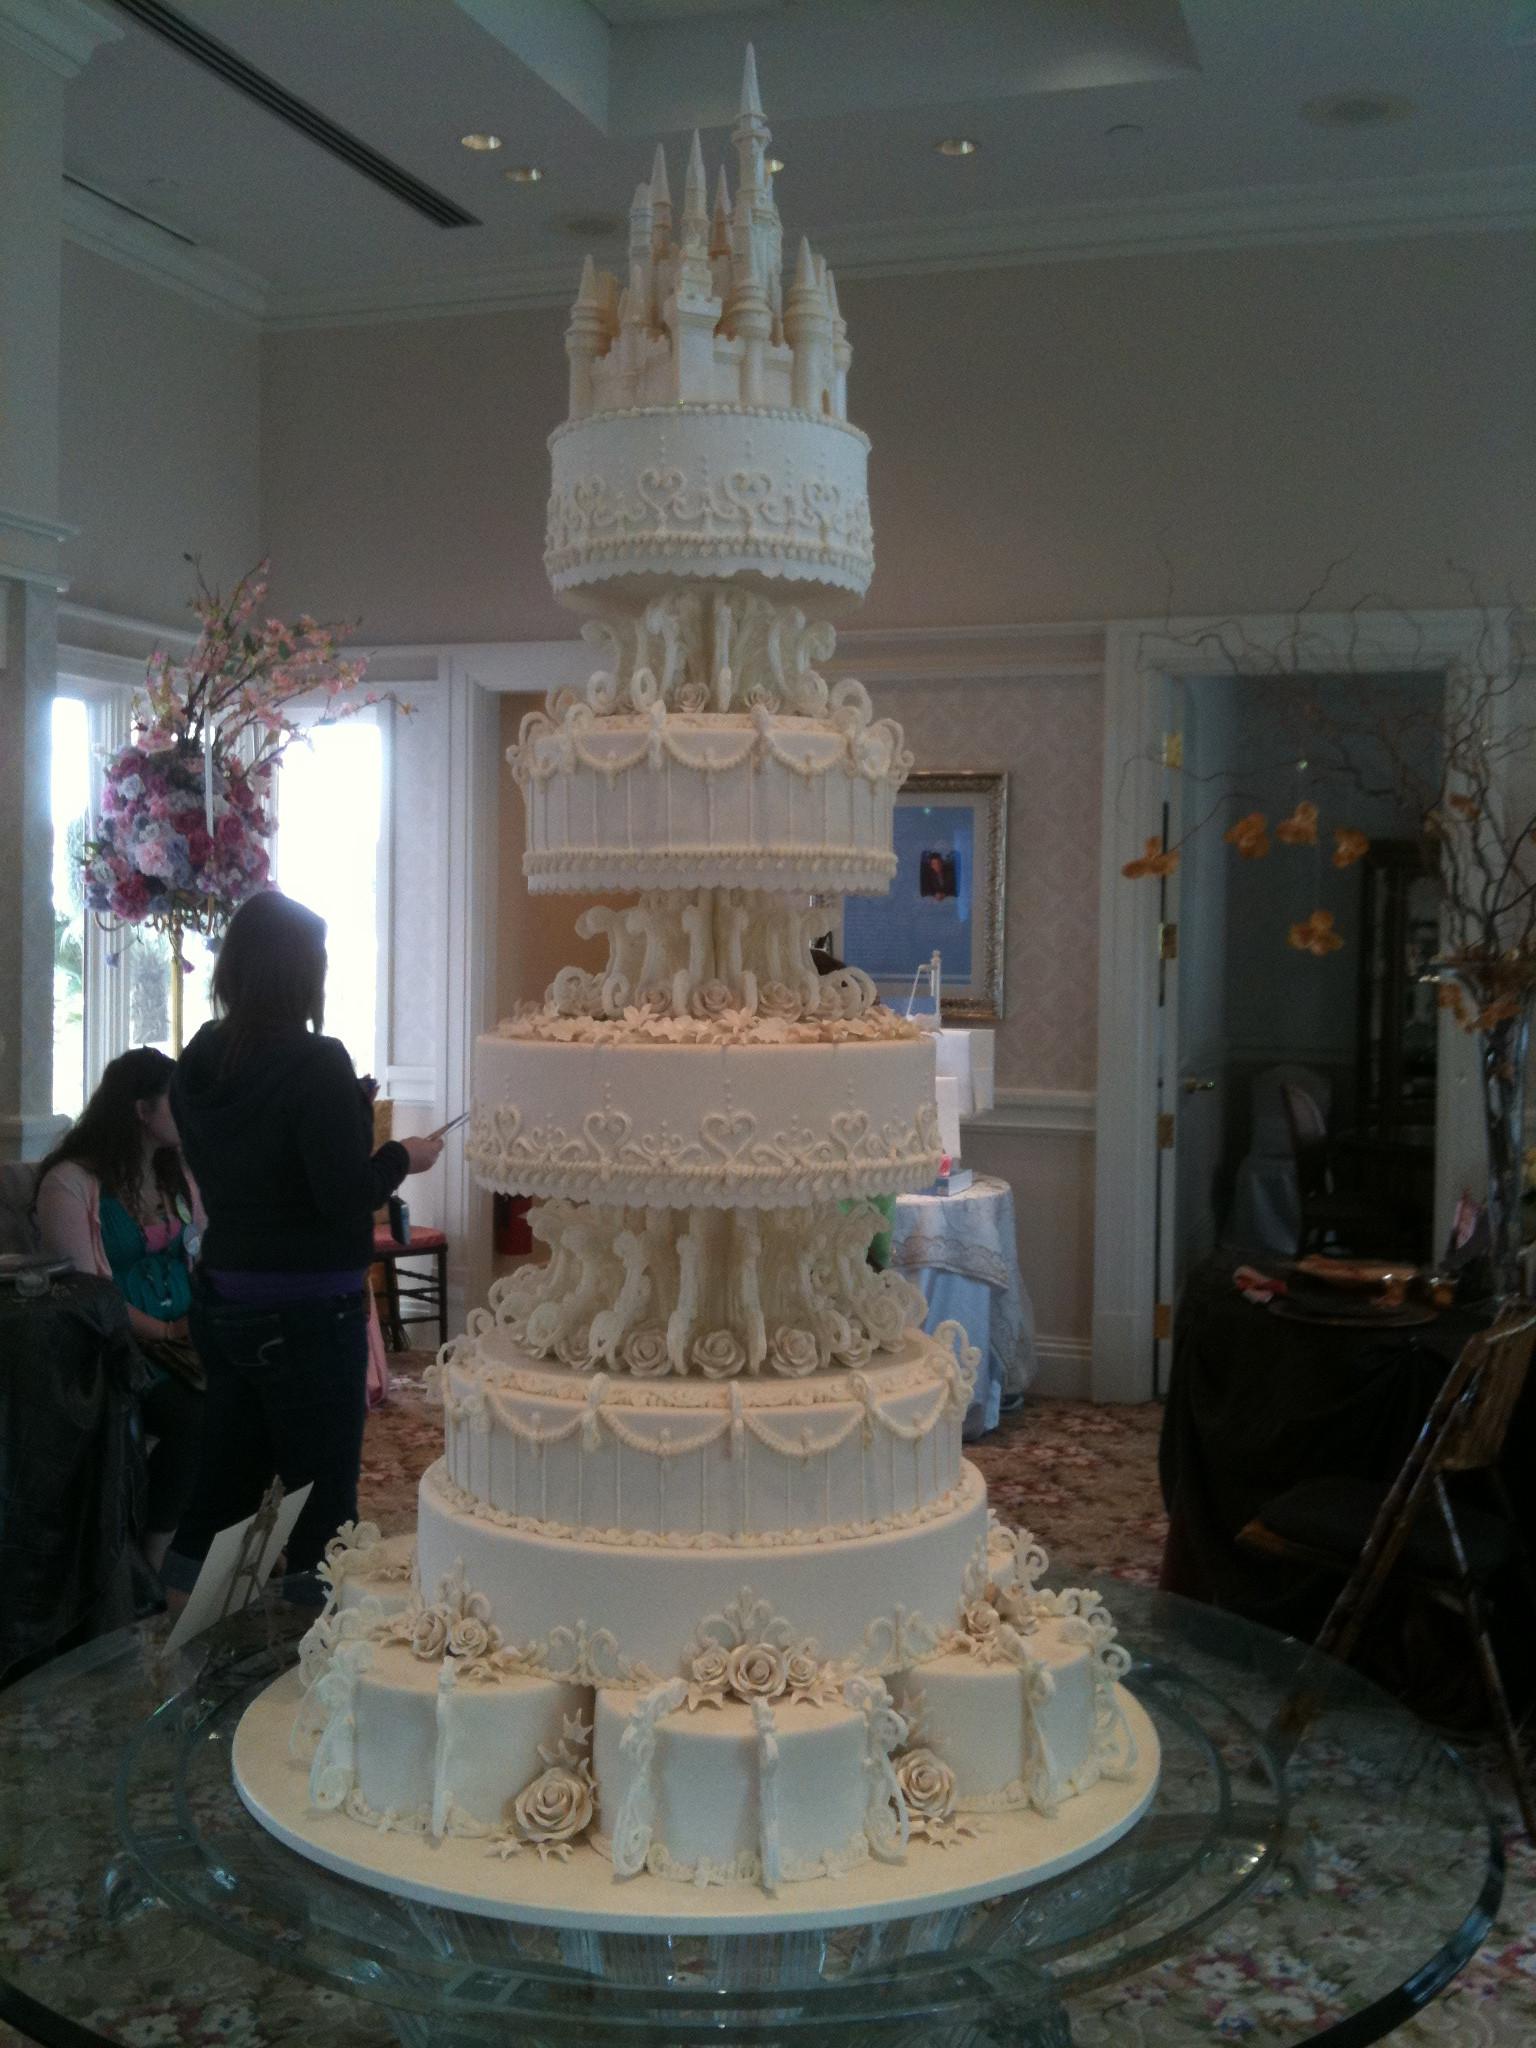 Disney Wedding Cakes  wedding cake toppers Cinderella Wedding Cake Toppers